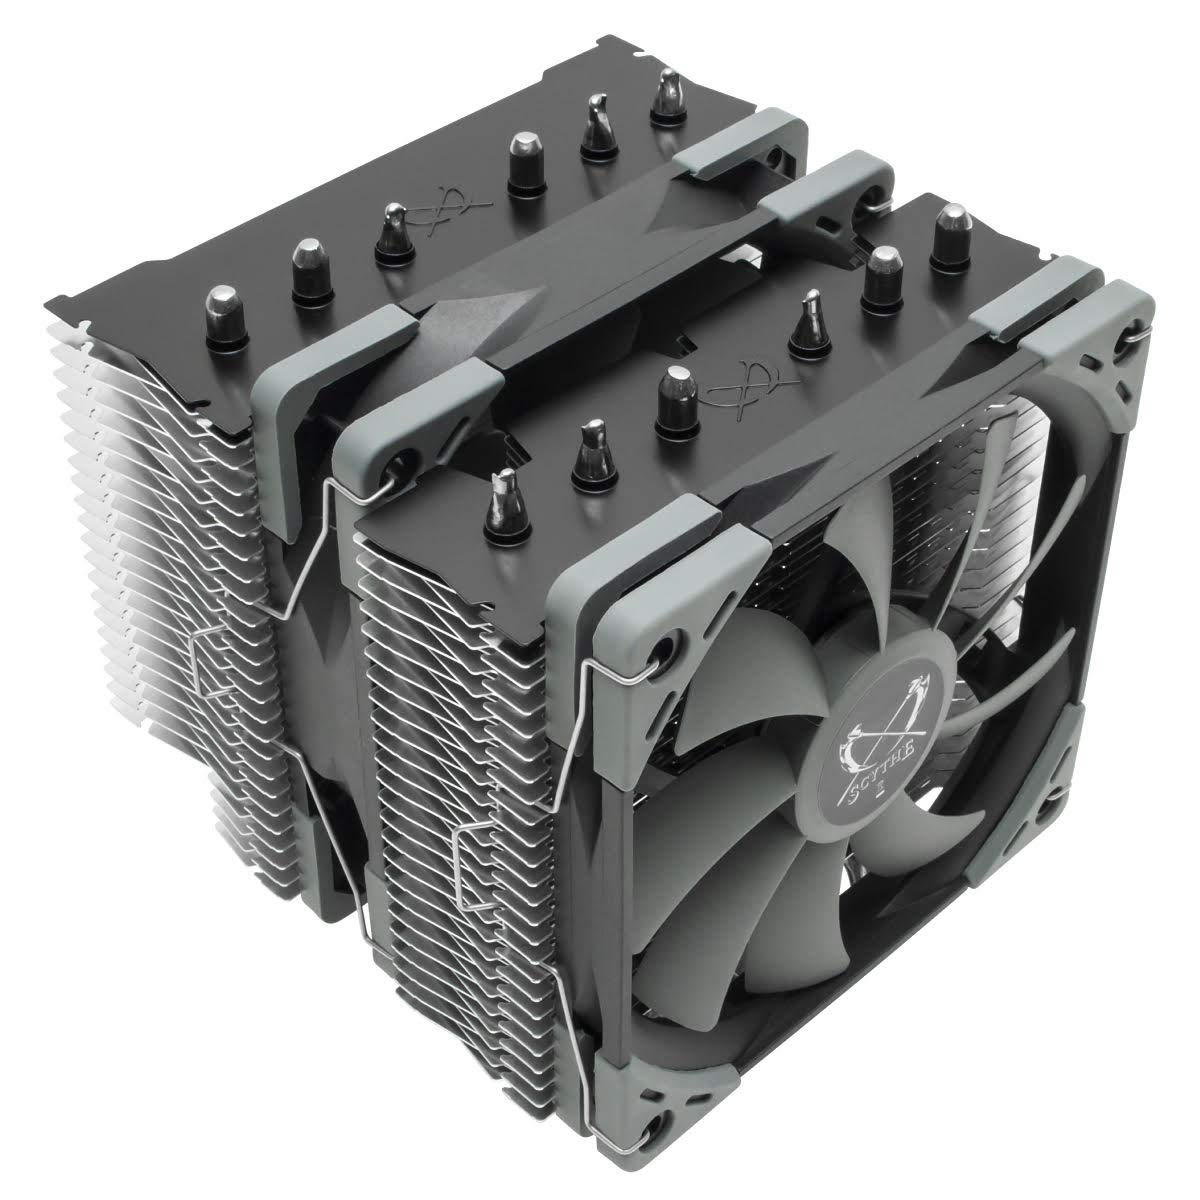 Scythe Fuma 2 120mm Air CPU Cooler, Twin Tower Heatsinks with 6 heatpipes, Dual PWM Fans, Intel LGA1151, AMD AM4/Ryzen by SCYTHE